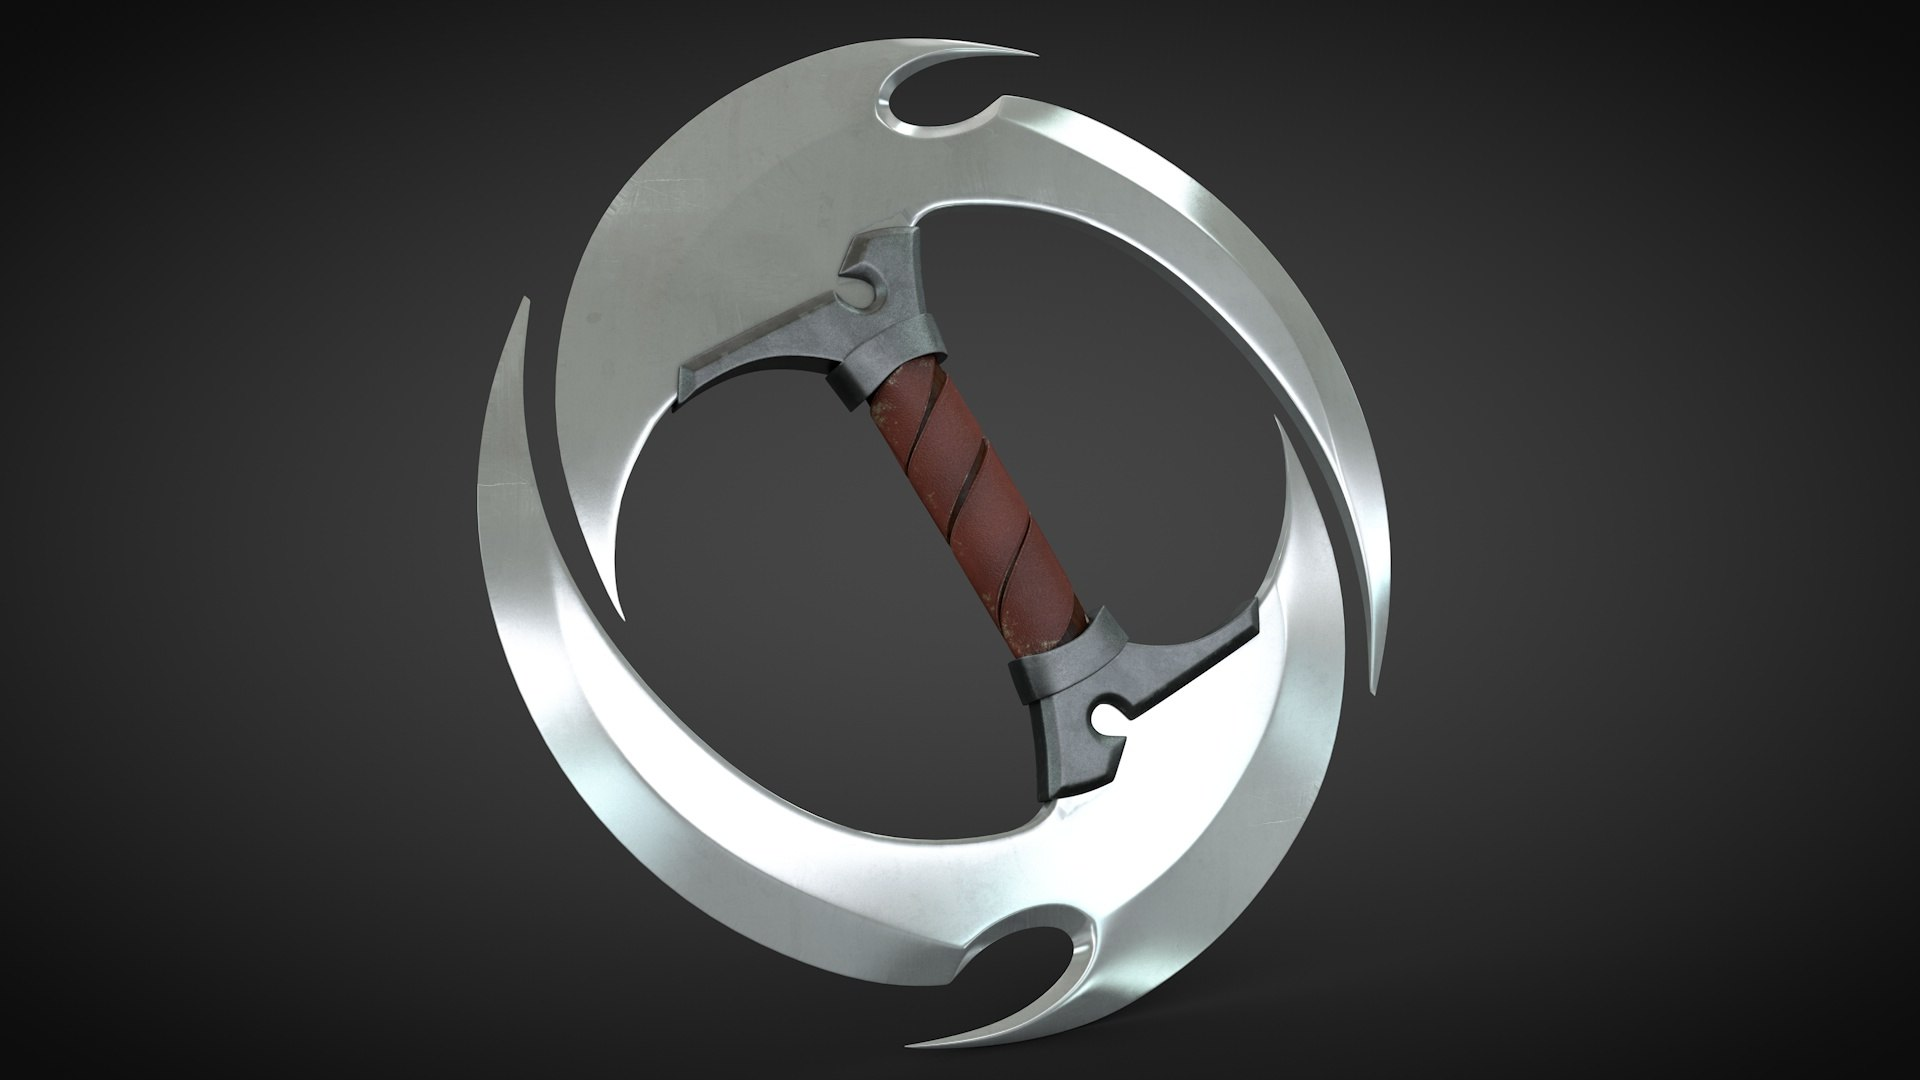 Noir Ecryola's [NEW] Vault Ring_Dagger_01.jpg3D4FB9E0-18E9-40B3-8825-7840B5990E67Default